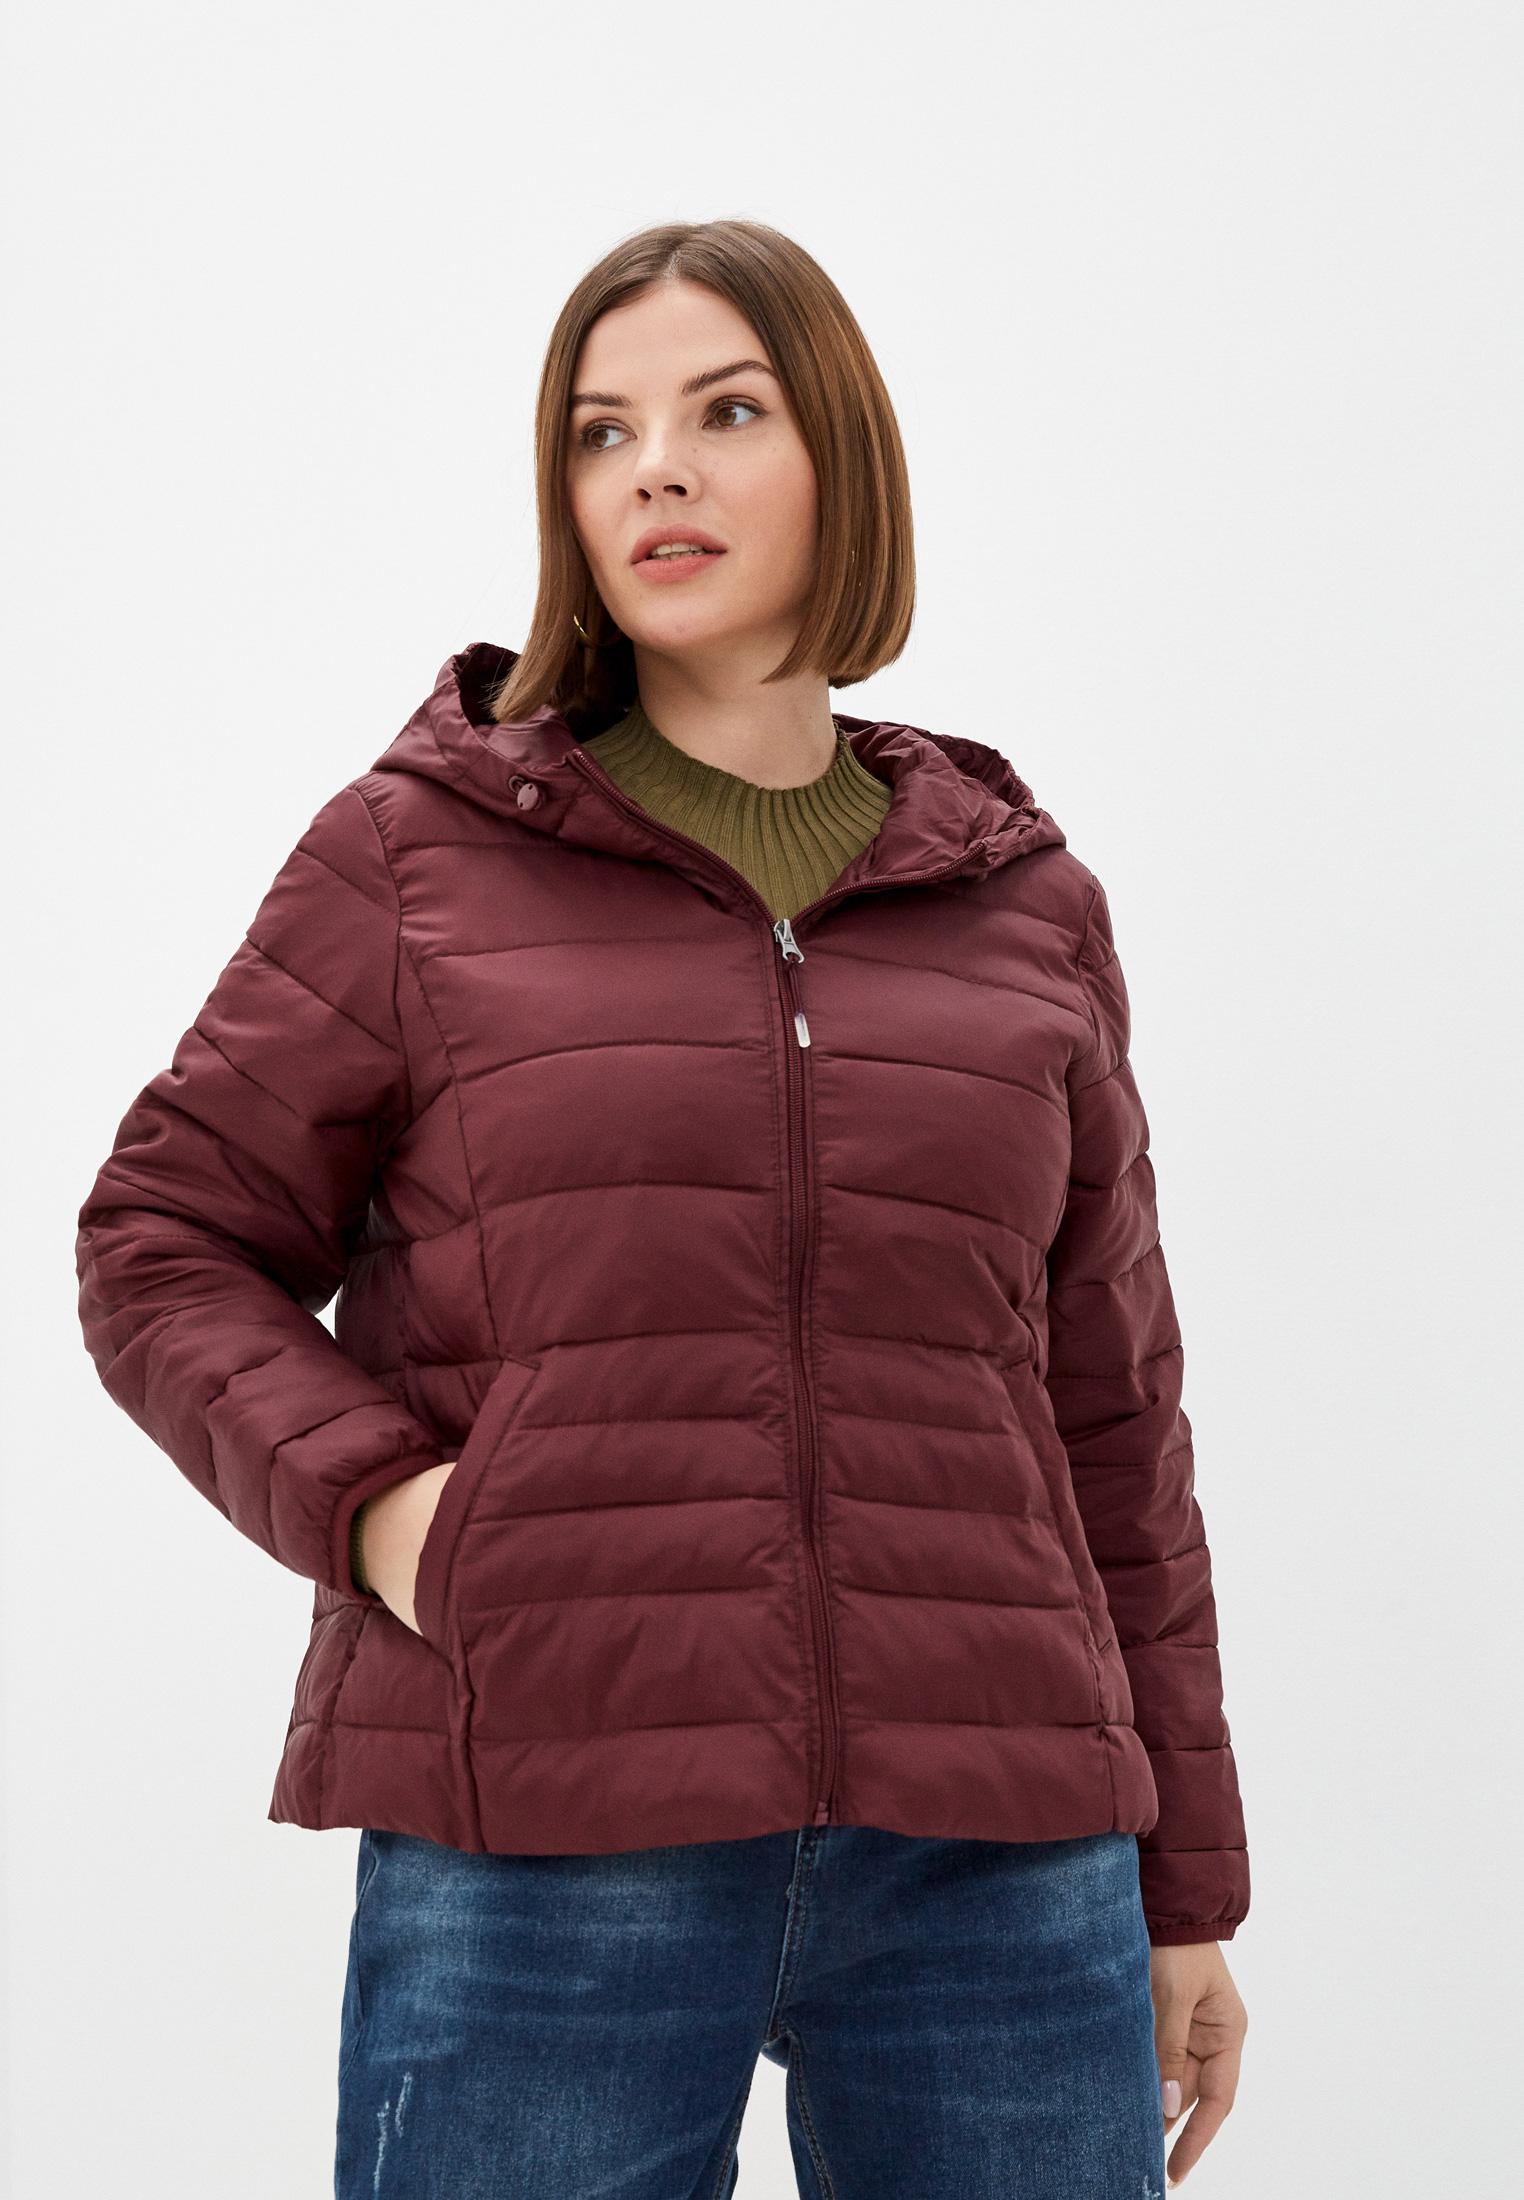 Утепленная куртка Vero Moda Curve Куртка утепленная Vero Moda Curve